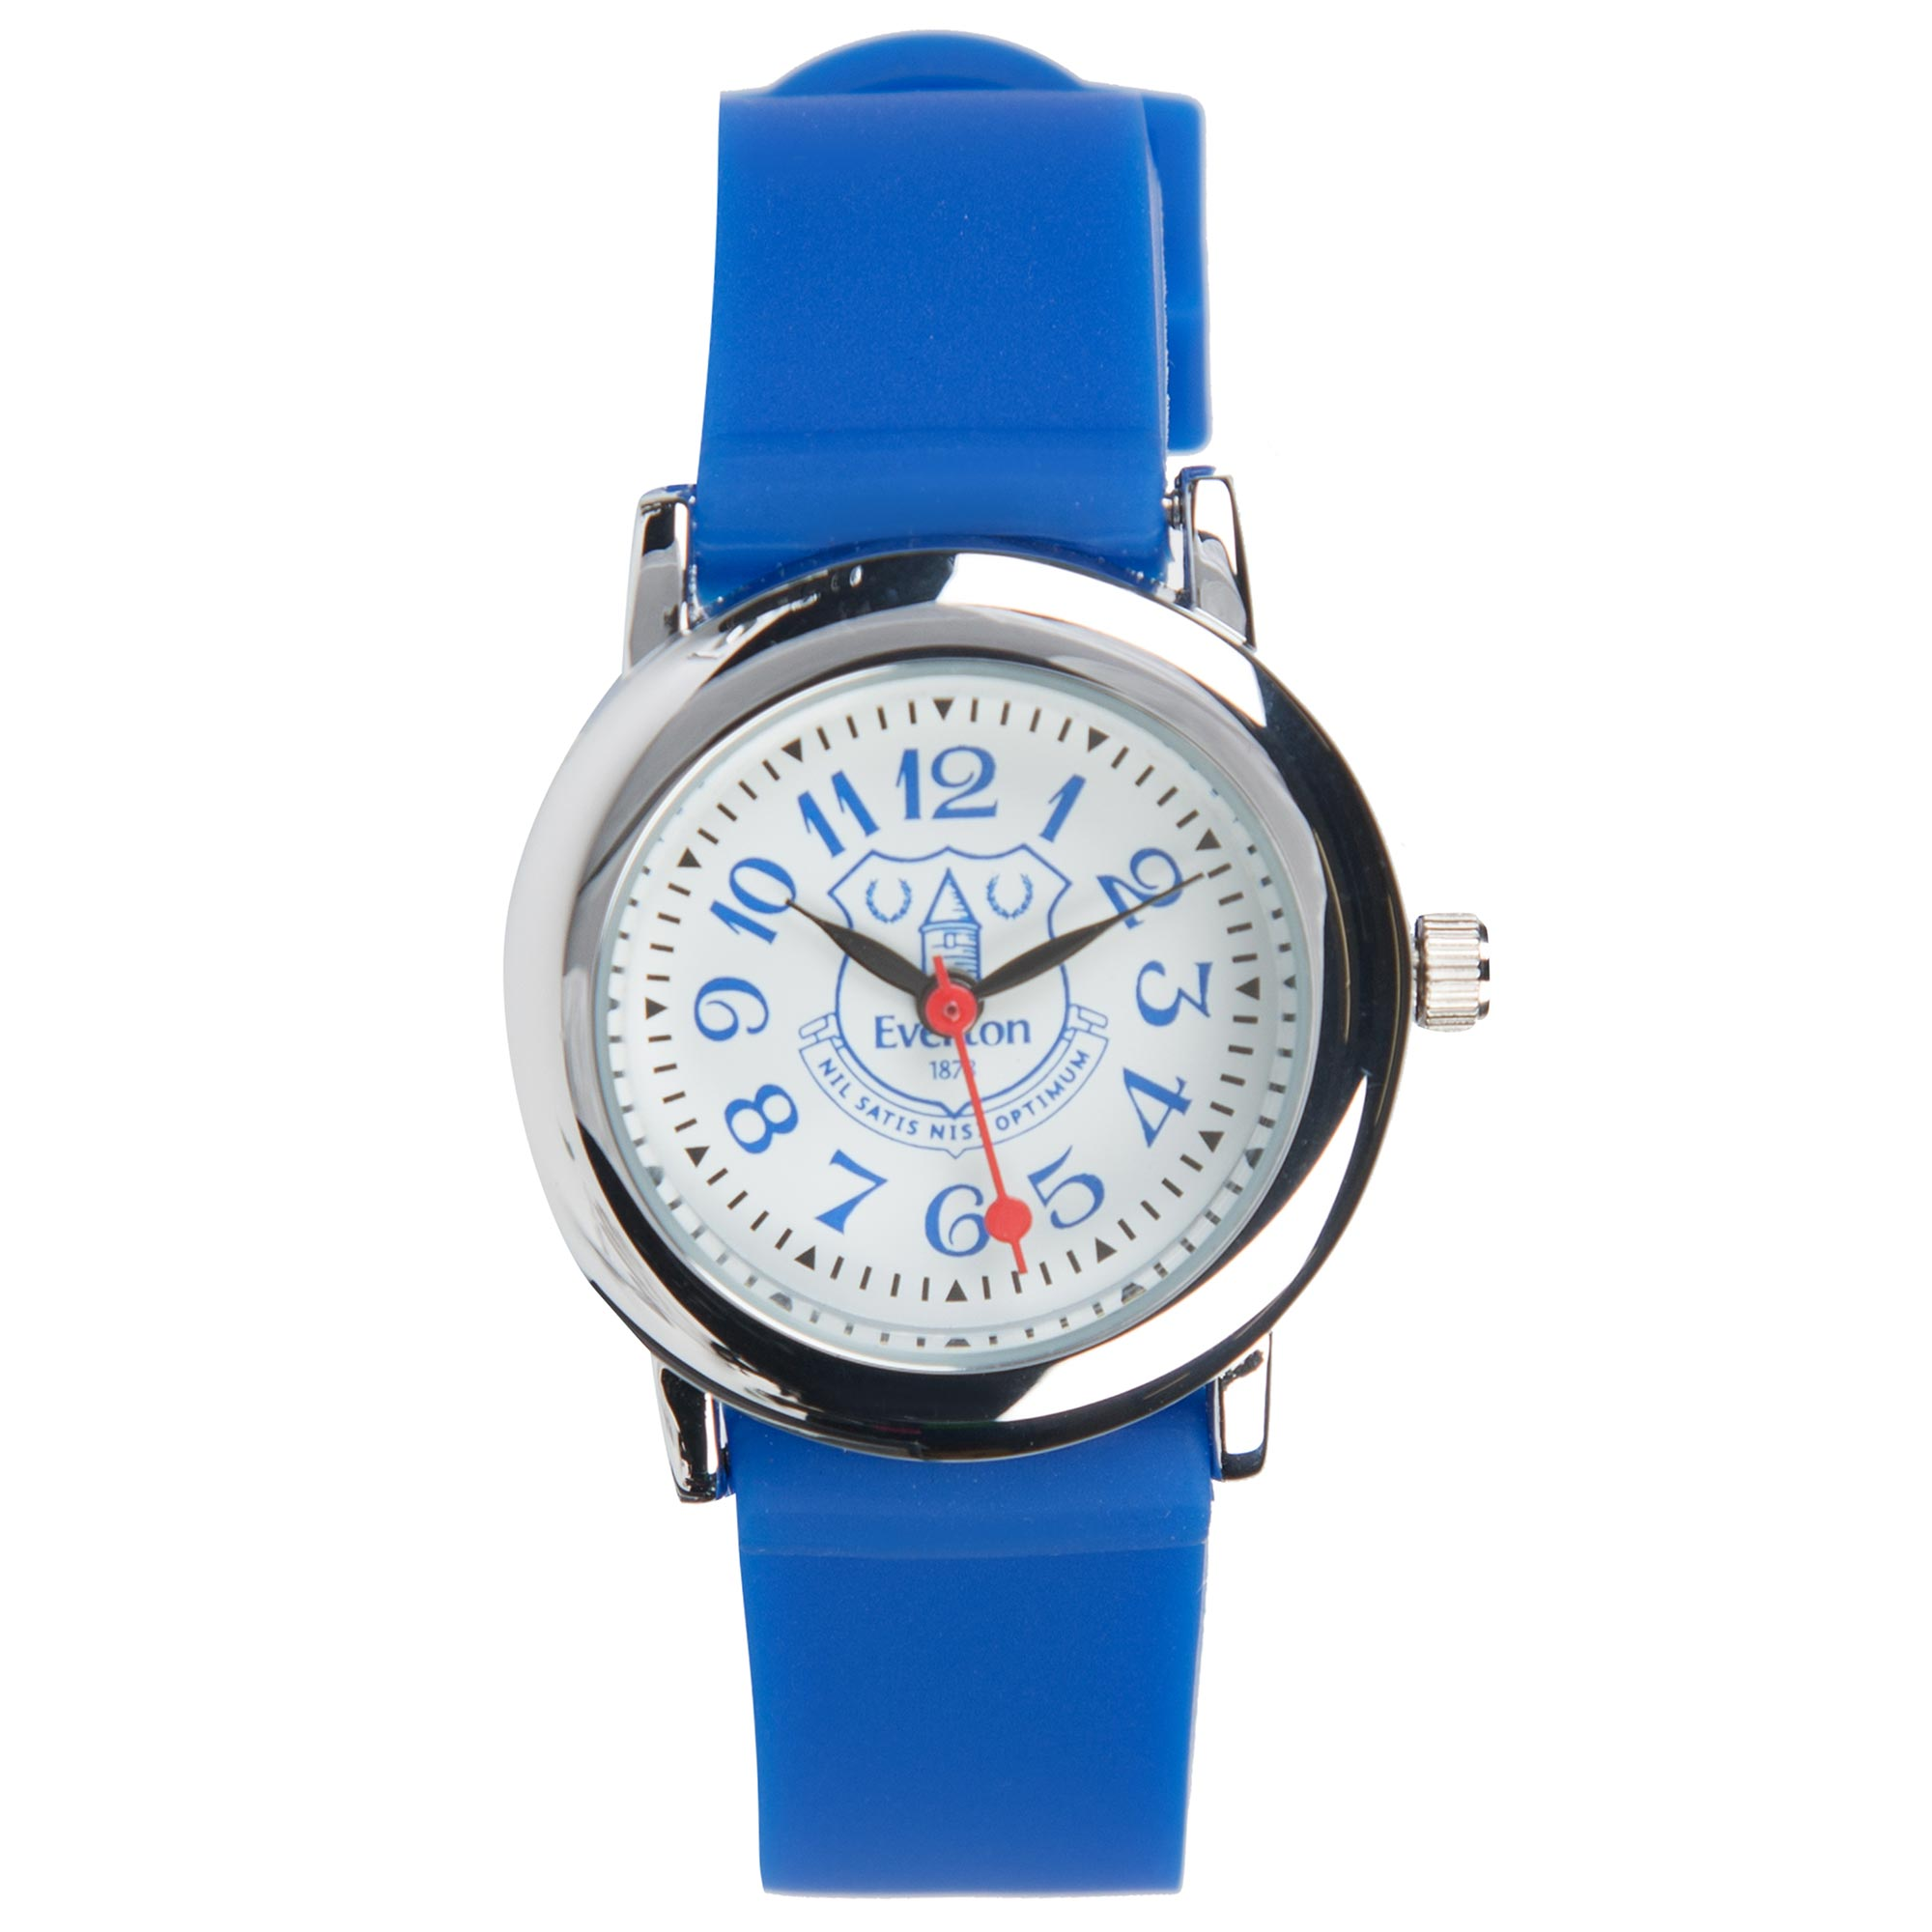 Image of Everton Analog Plastic Watch - Junior